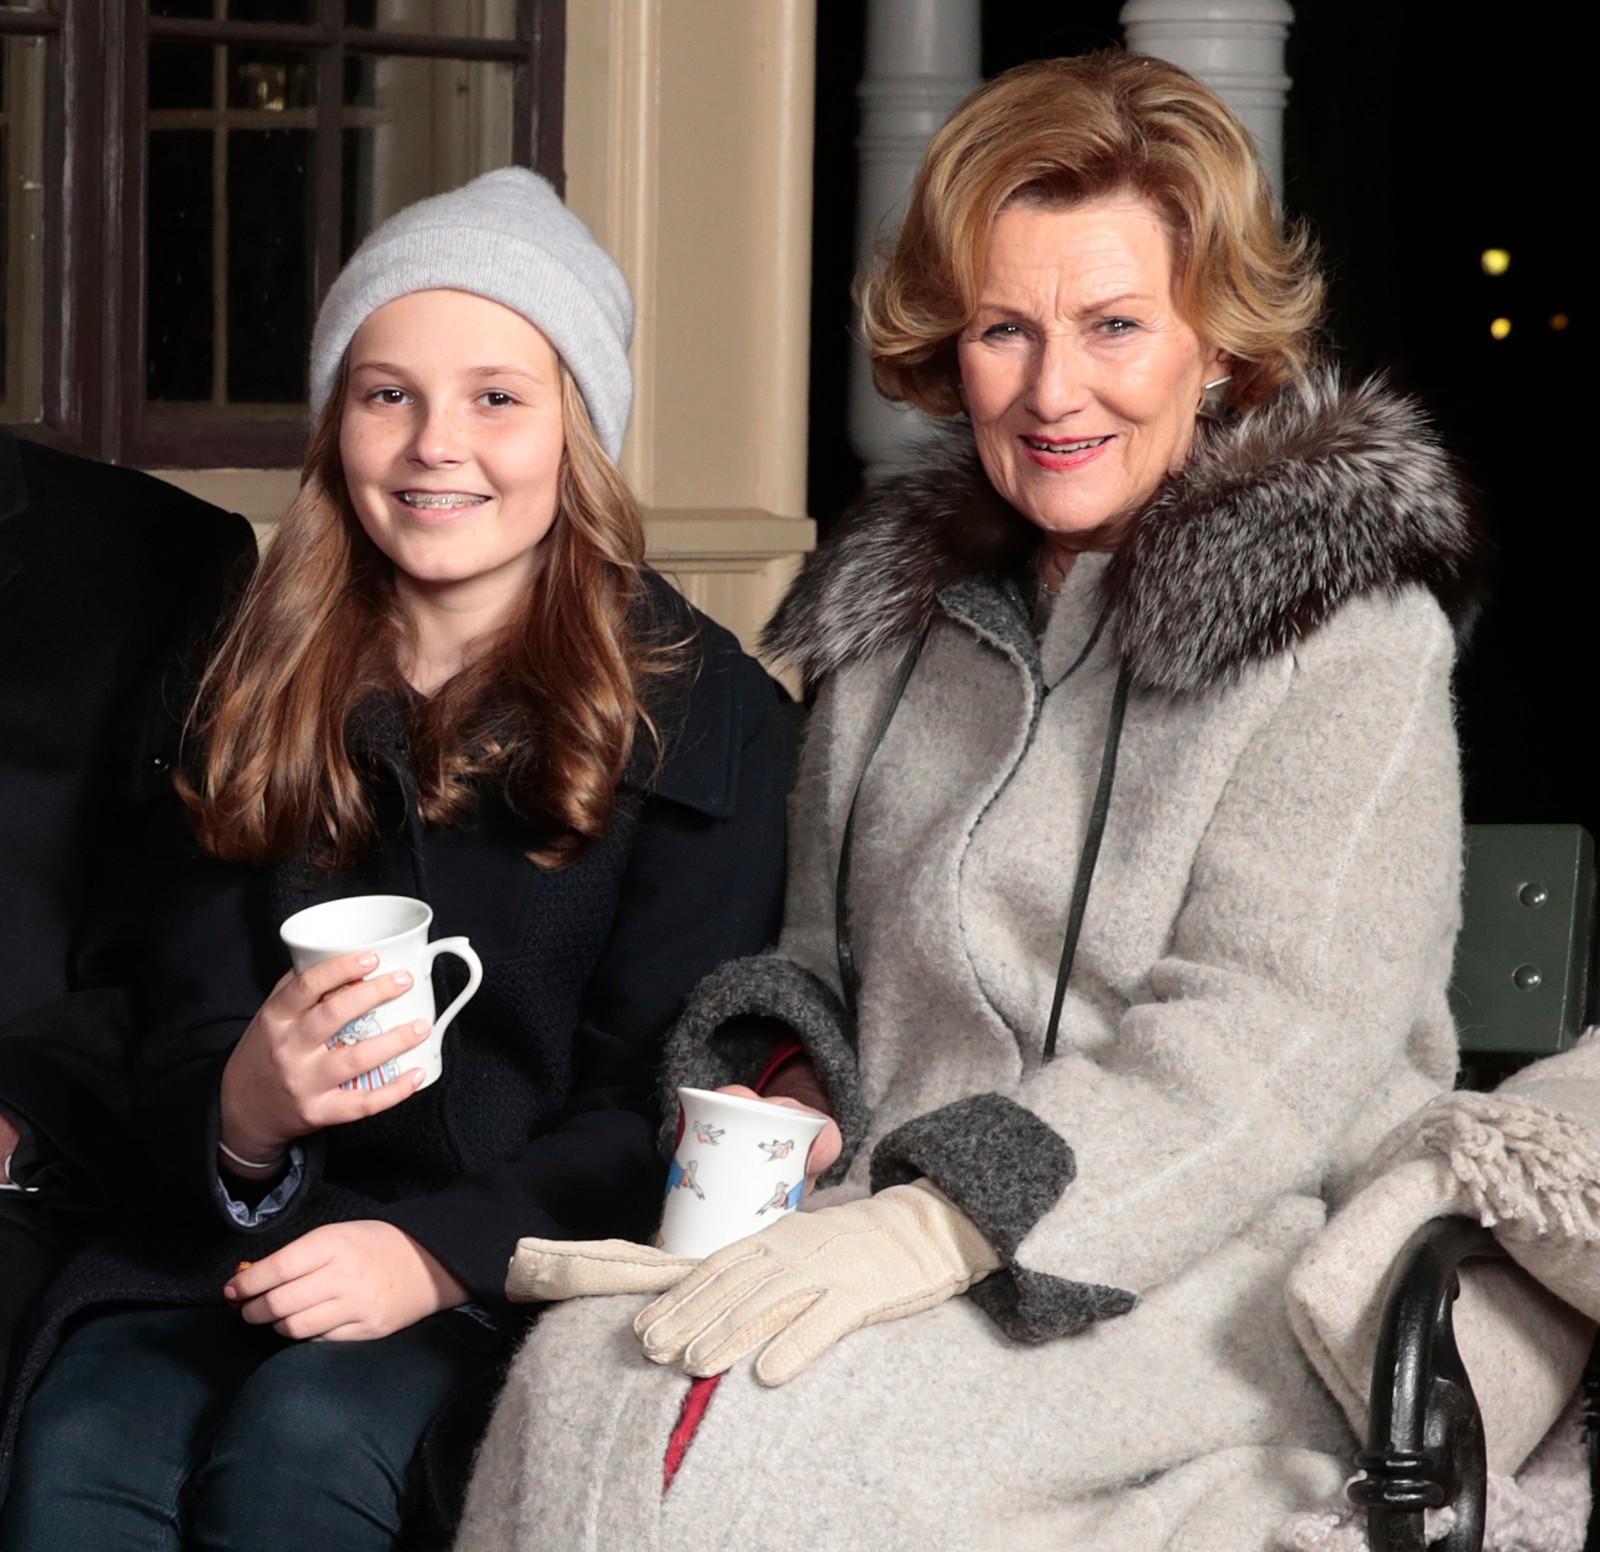 SNART TENÅRING. Prinsesse Ingrid Alexandra saman med bestemor på julefotografering foran lysthuset i dronningparken like før jul i fjor.